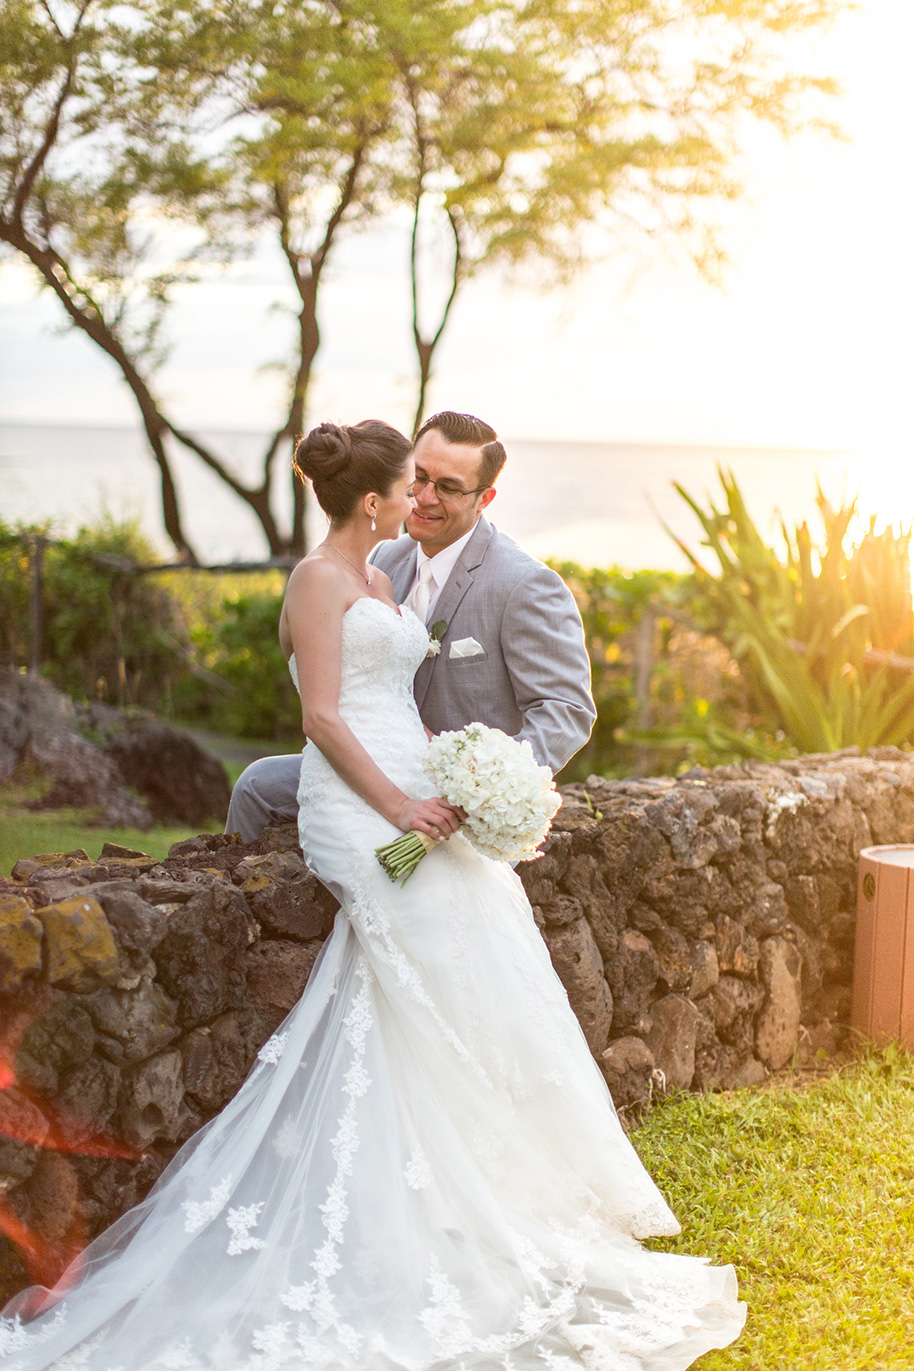 Maui-Ocean-Front-Wedding-070816-18